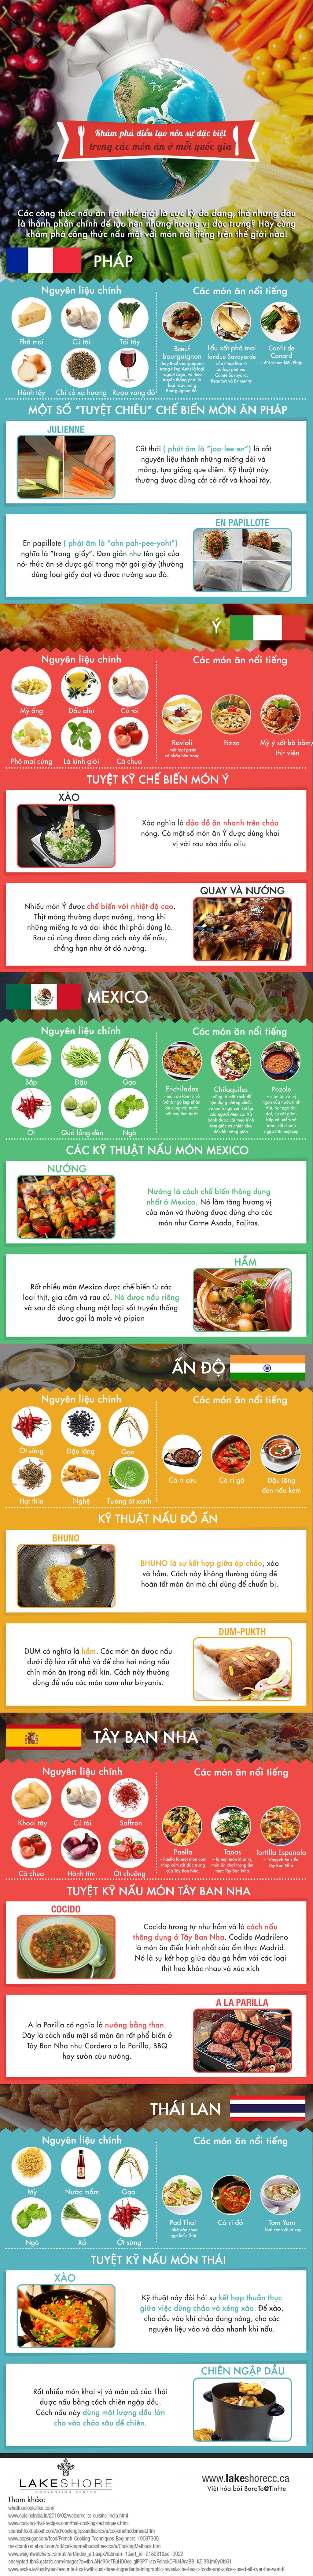 3015111_Infographic_mon_an_ngon_tren_the_gioi (1)